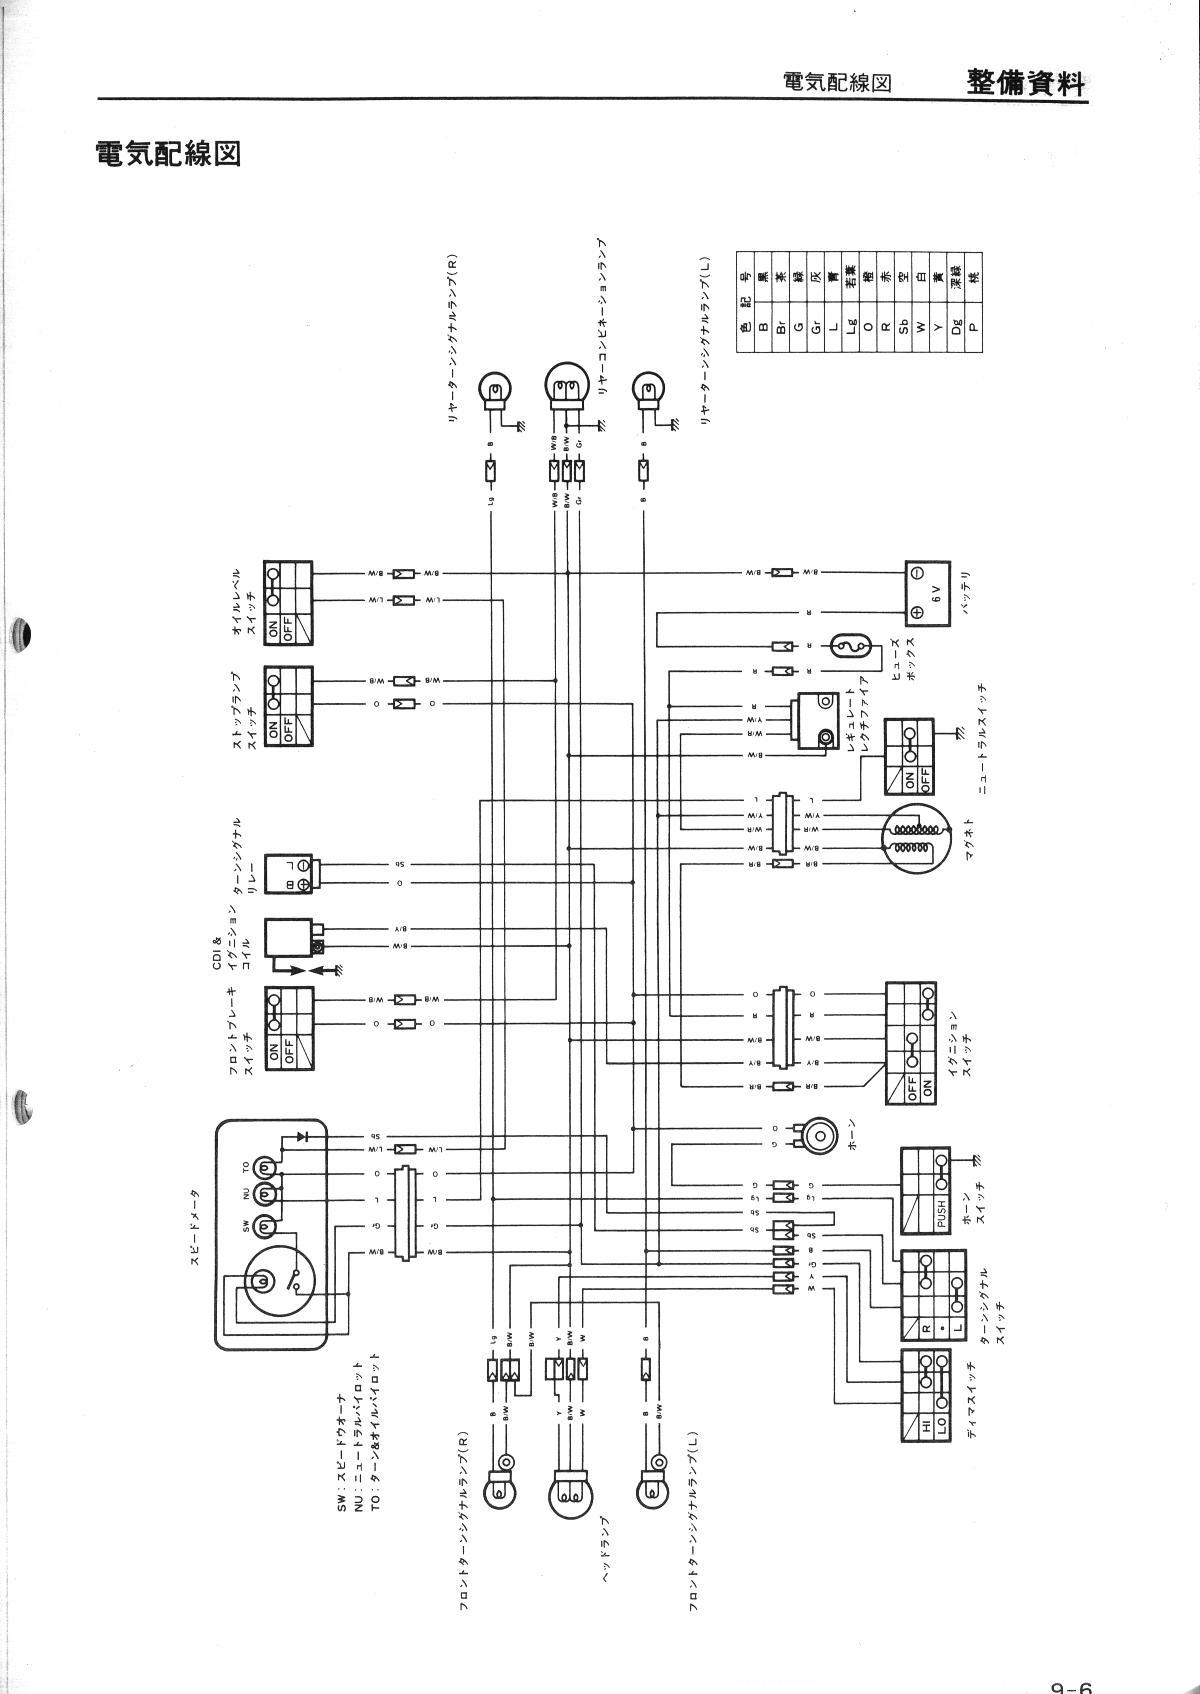 Square D Shunt Trip Breaker Wiring Diagram